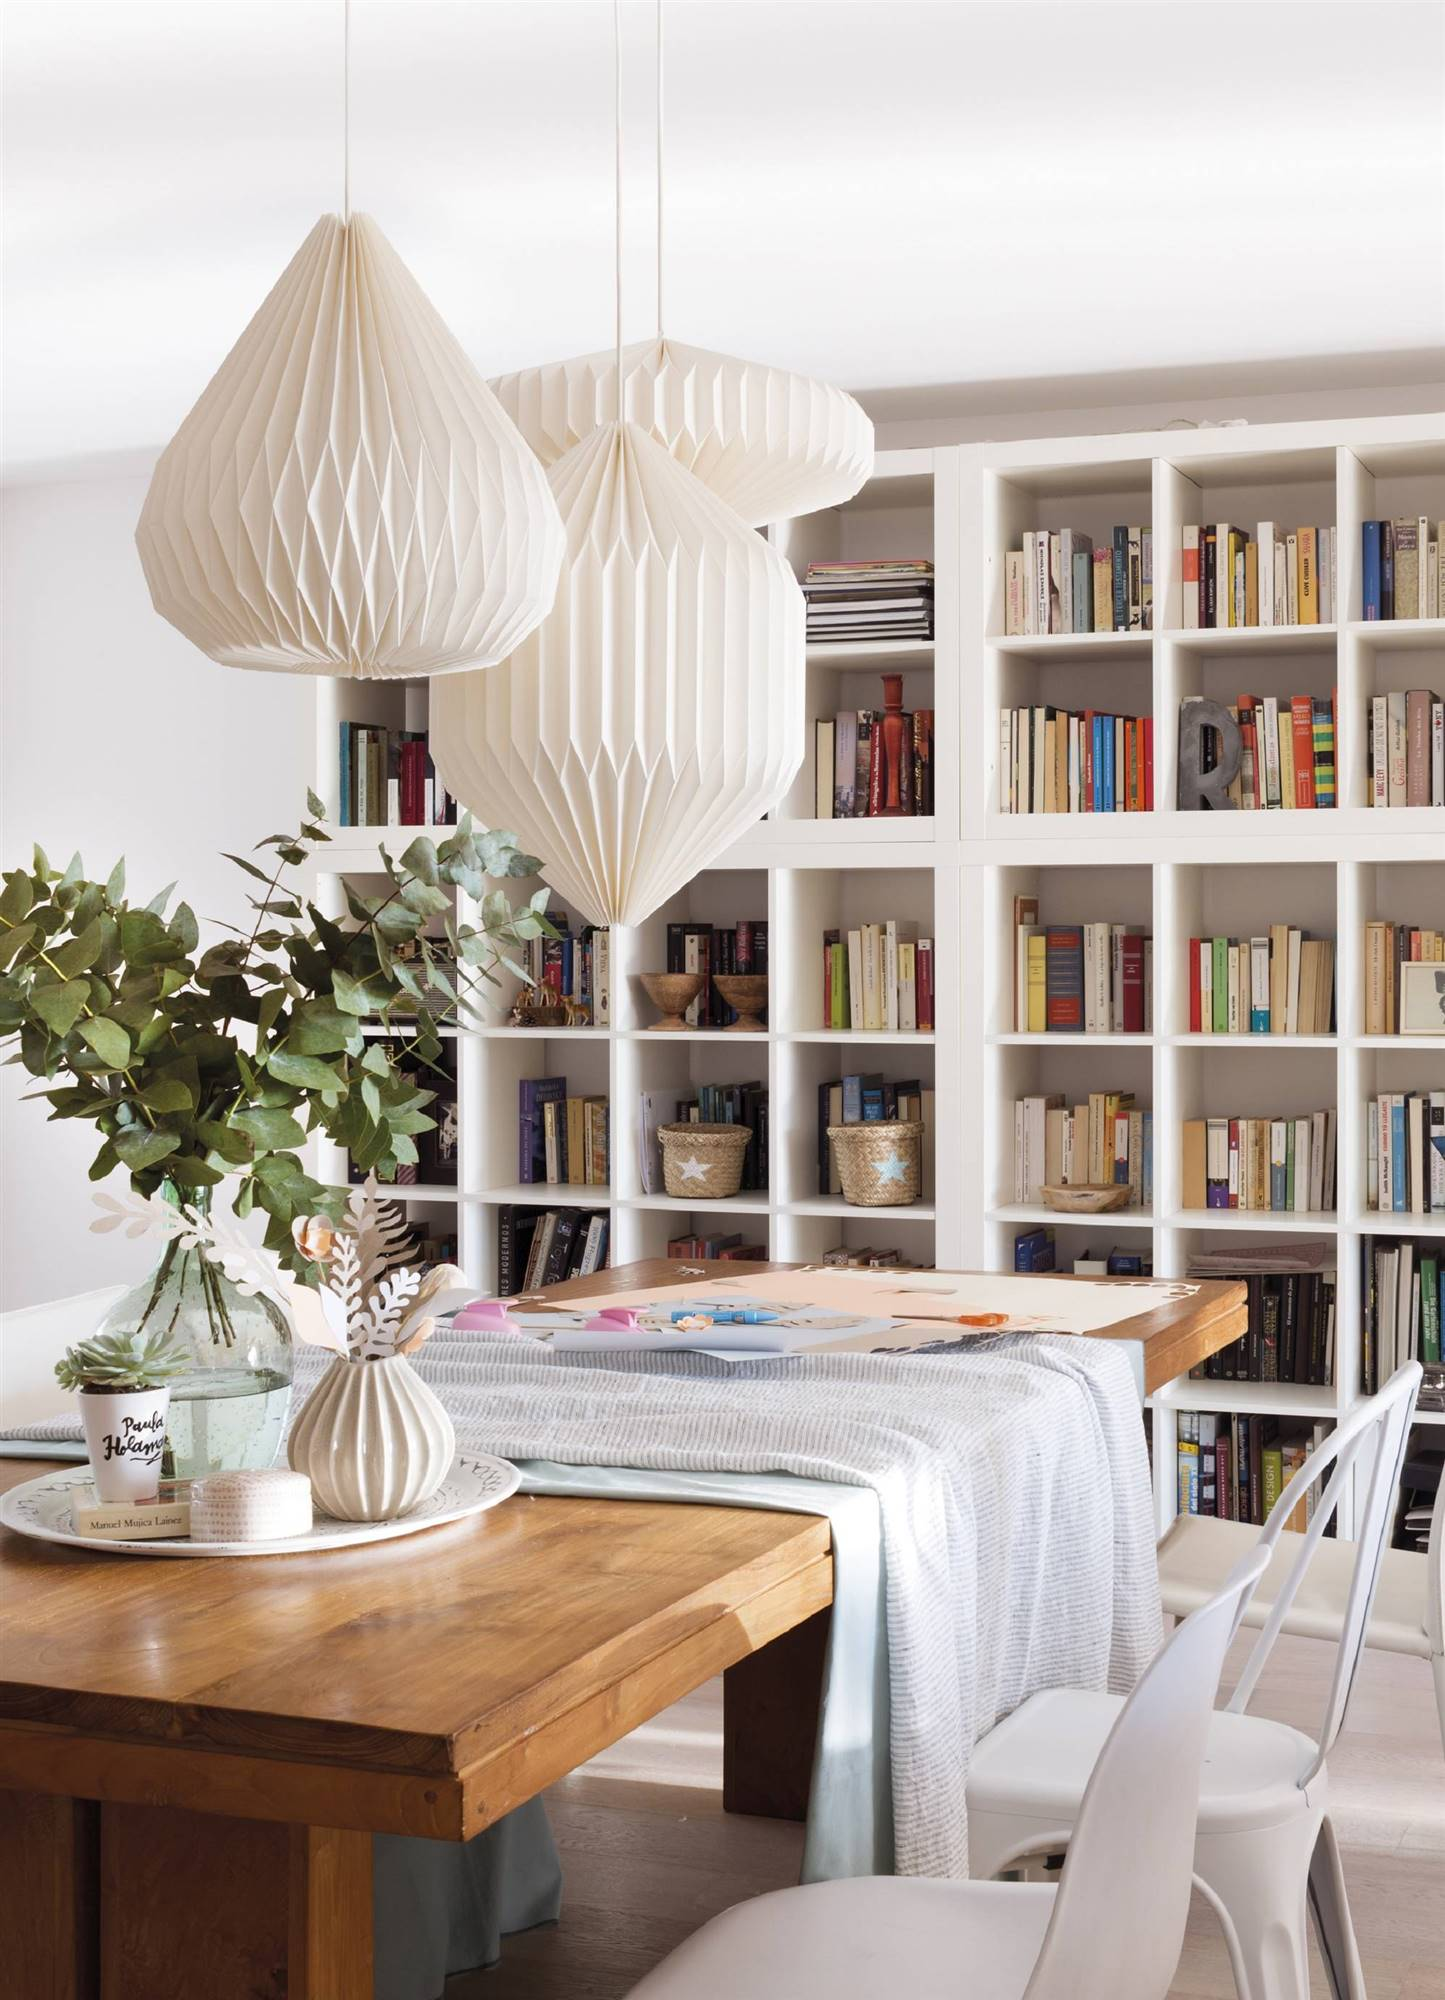 2157 fotos de l mparas - Librerias salon blancas ...